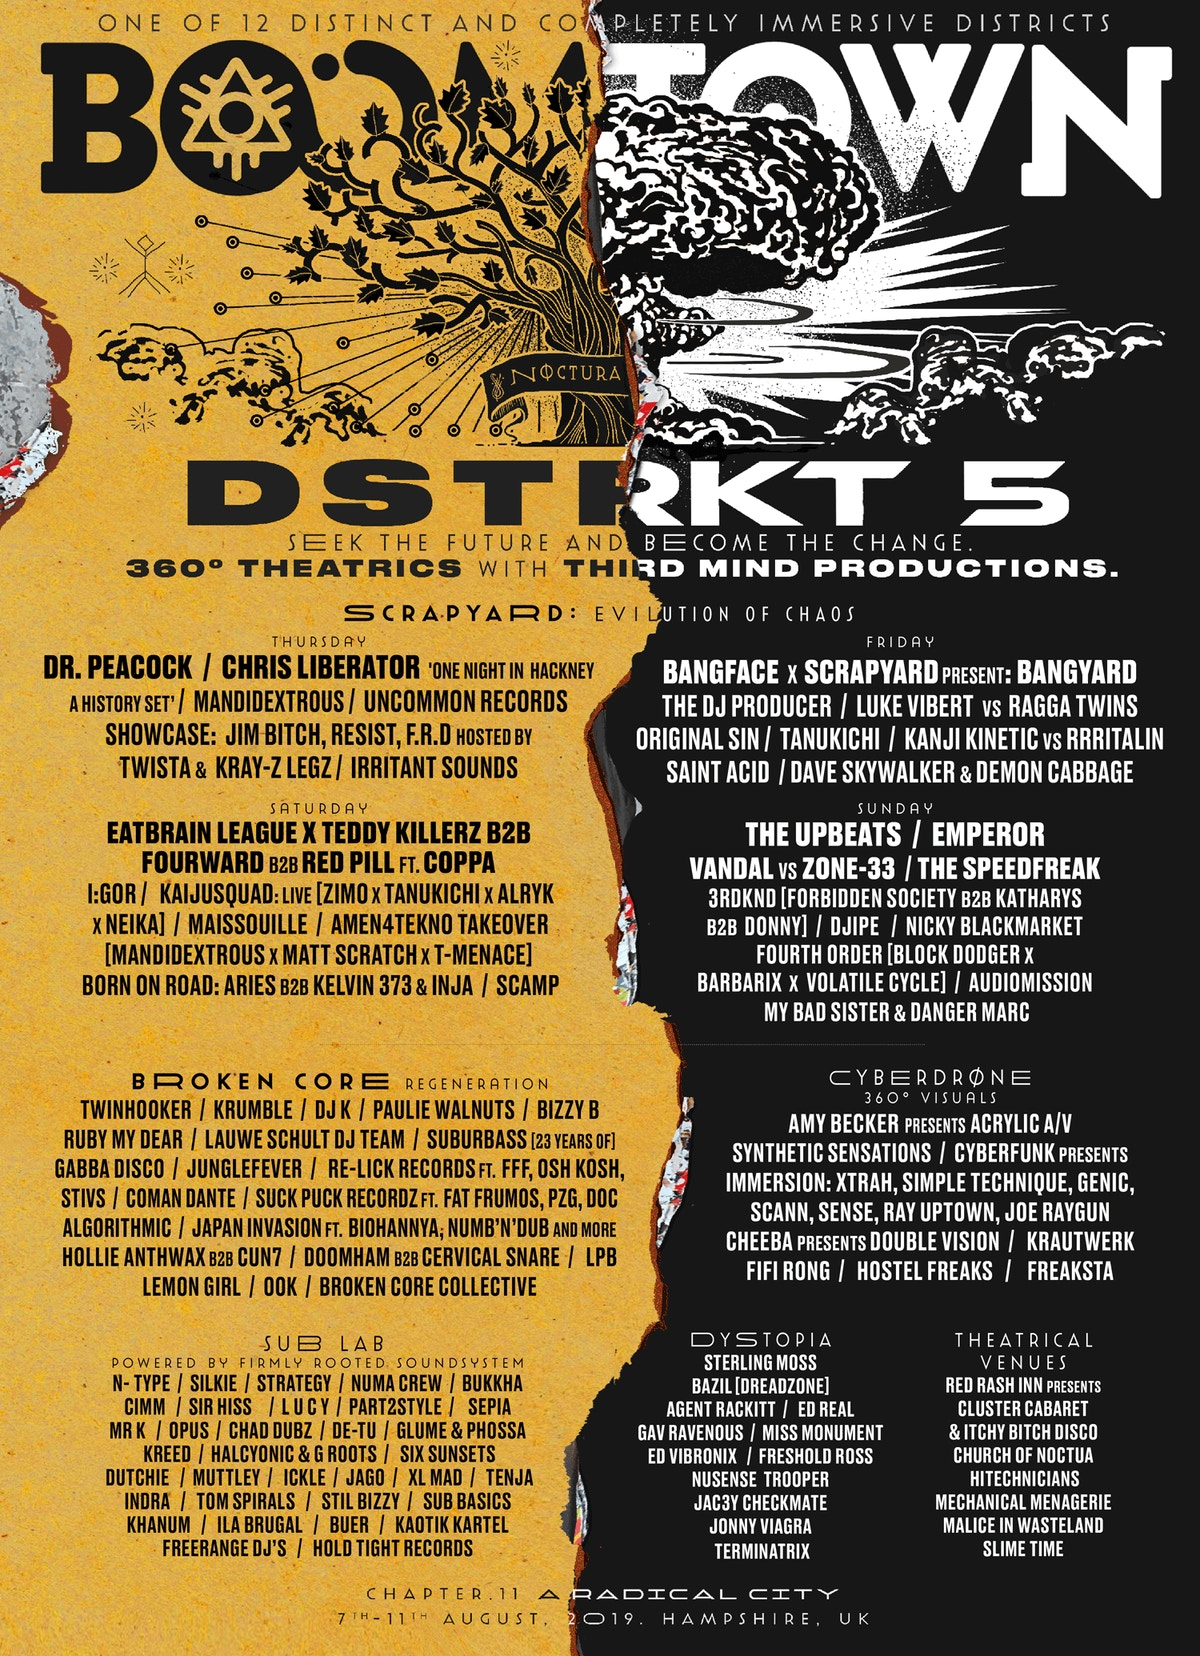 DISTRICT ANNOUNCEMENT: DSTRKT 5 | Boomtown Chapter 12 - New